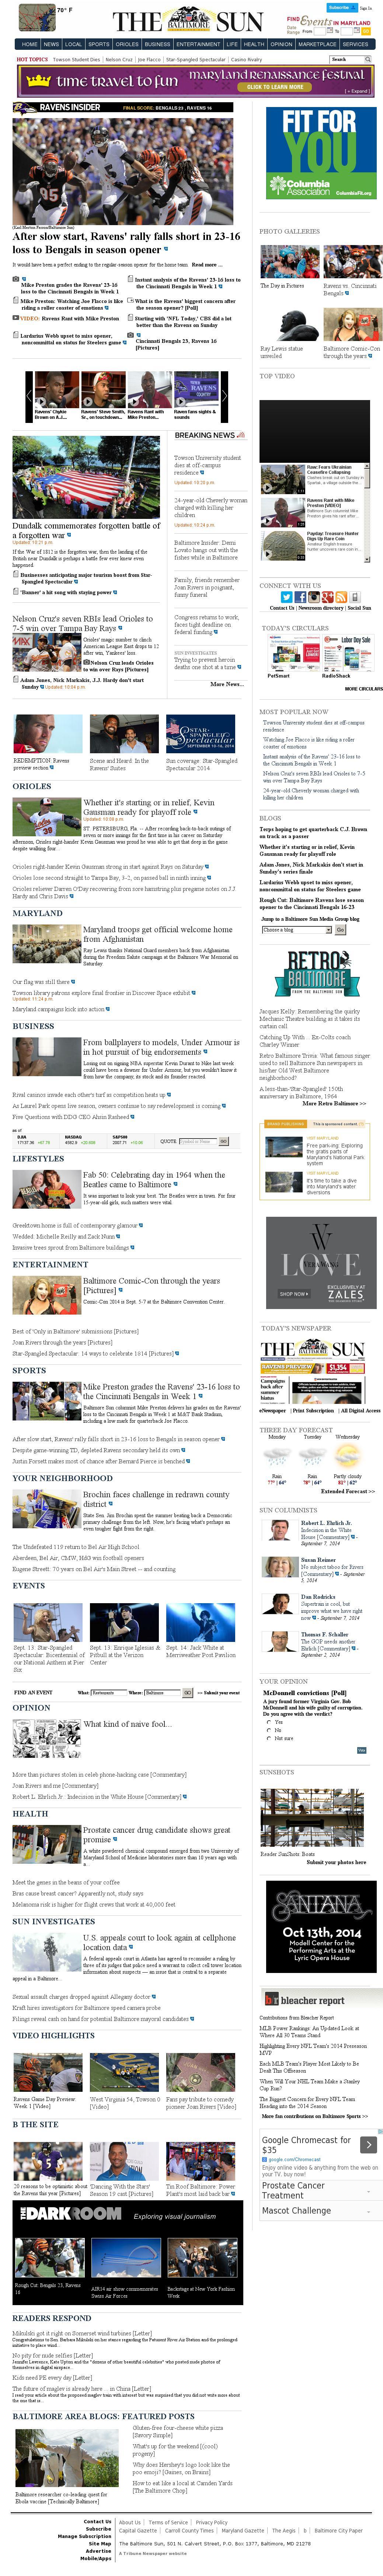 The Baltimore Sun at Monday Sept. 8, 2014, 5 a.m. UTC